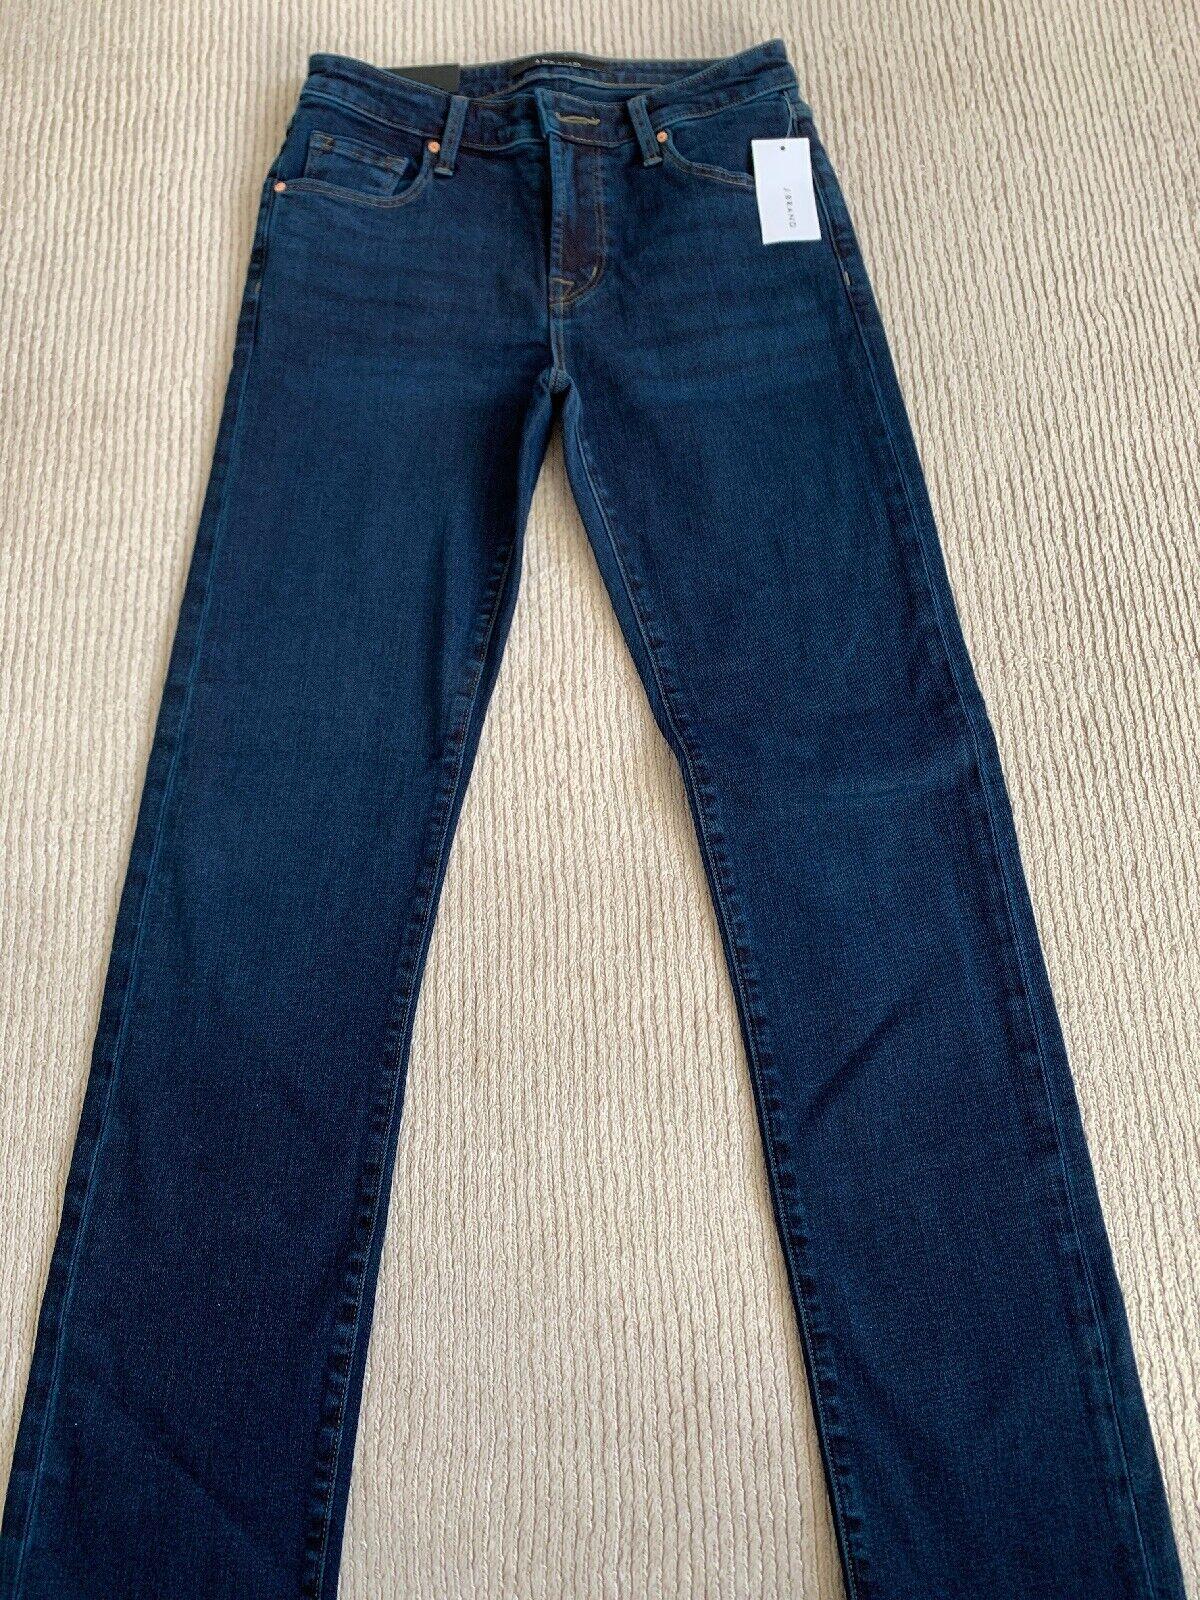 J Brand Jeans, Amelia Mid Rise Straight 25 BNWT